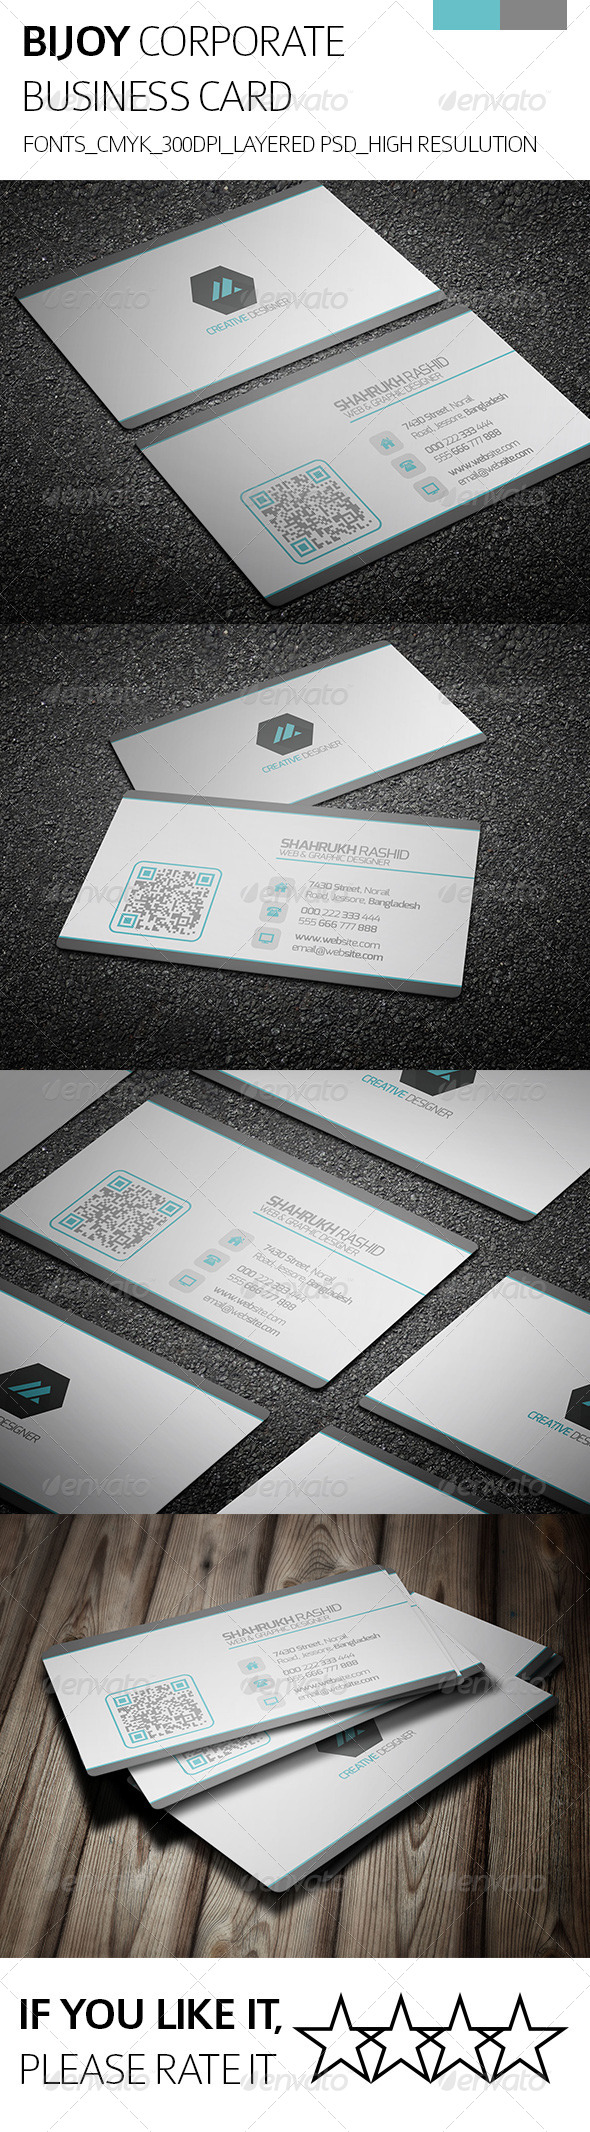 Bijoy & Corporate Business Card - Corporate Business Cards